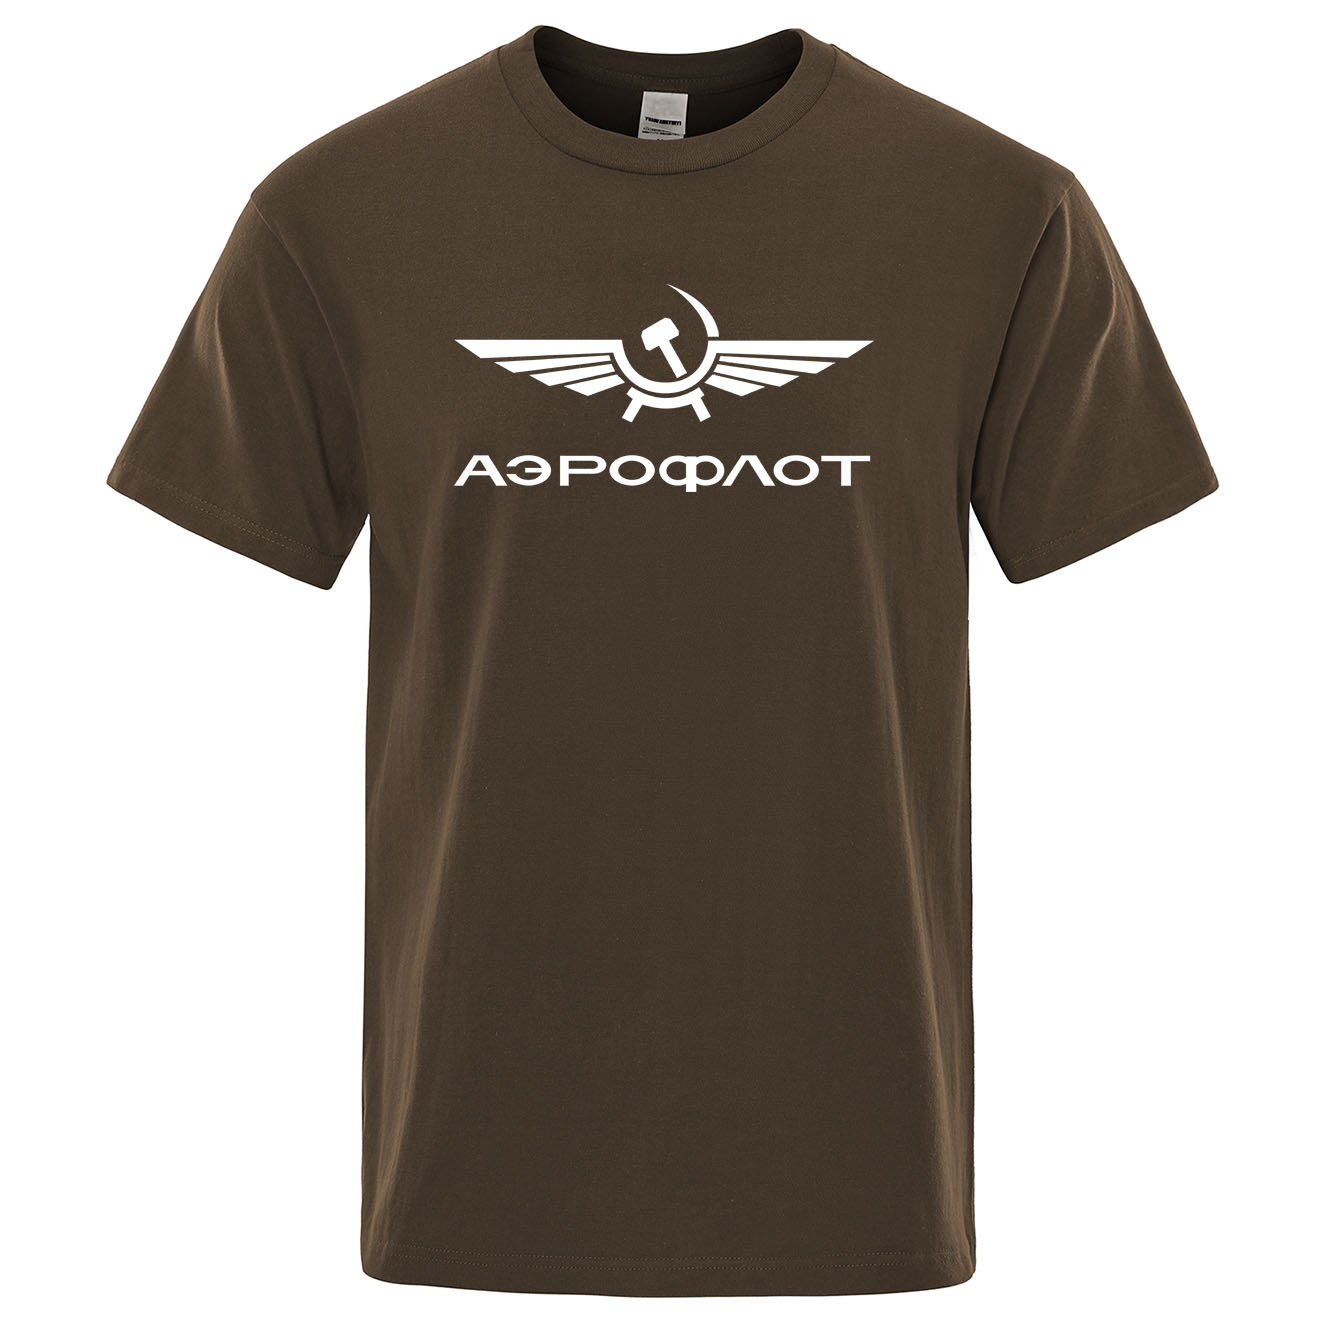 Aeroflot Aviation Russe Pilote Aerospace Aviateur T-Shirt Summer Cotton Short Sleeve Fashion Tops O-Neck Stylish Mens T Shirt